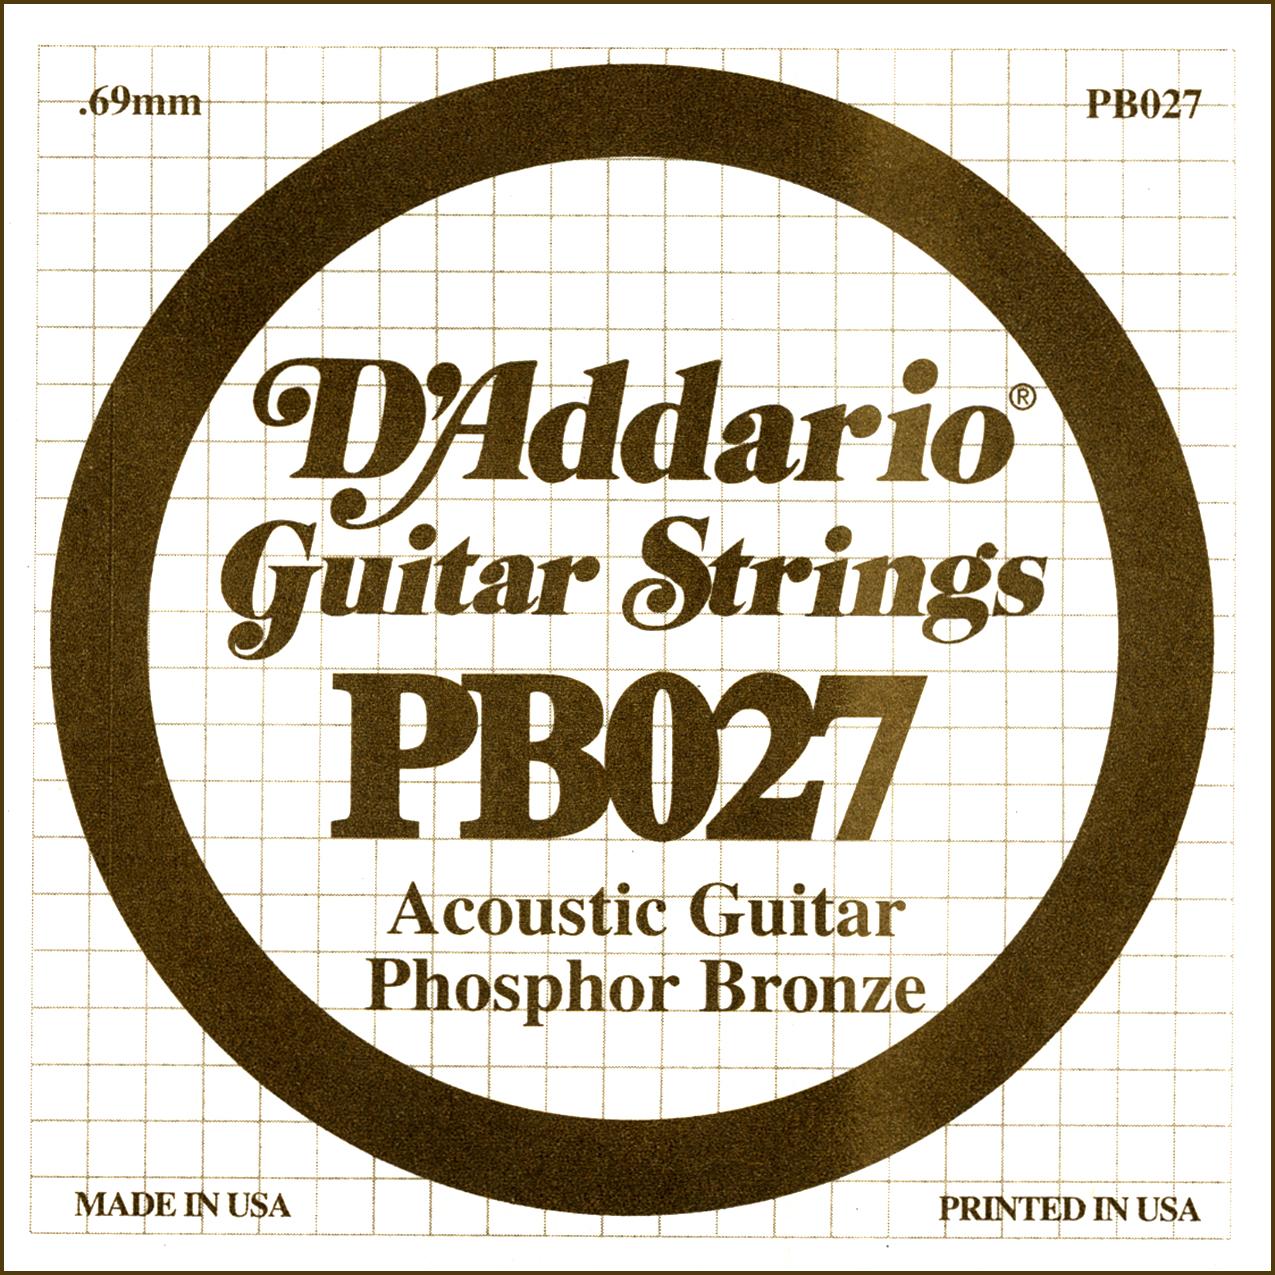 D'Addario Single Strings PBO27